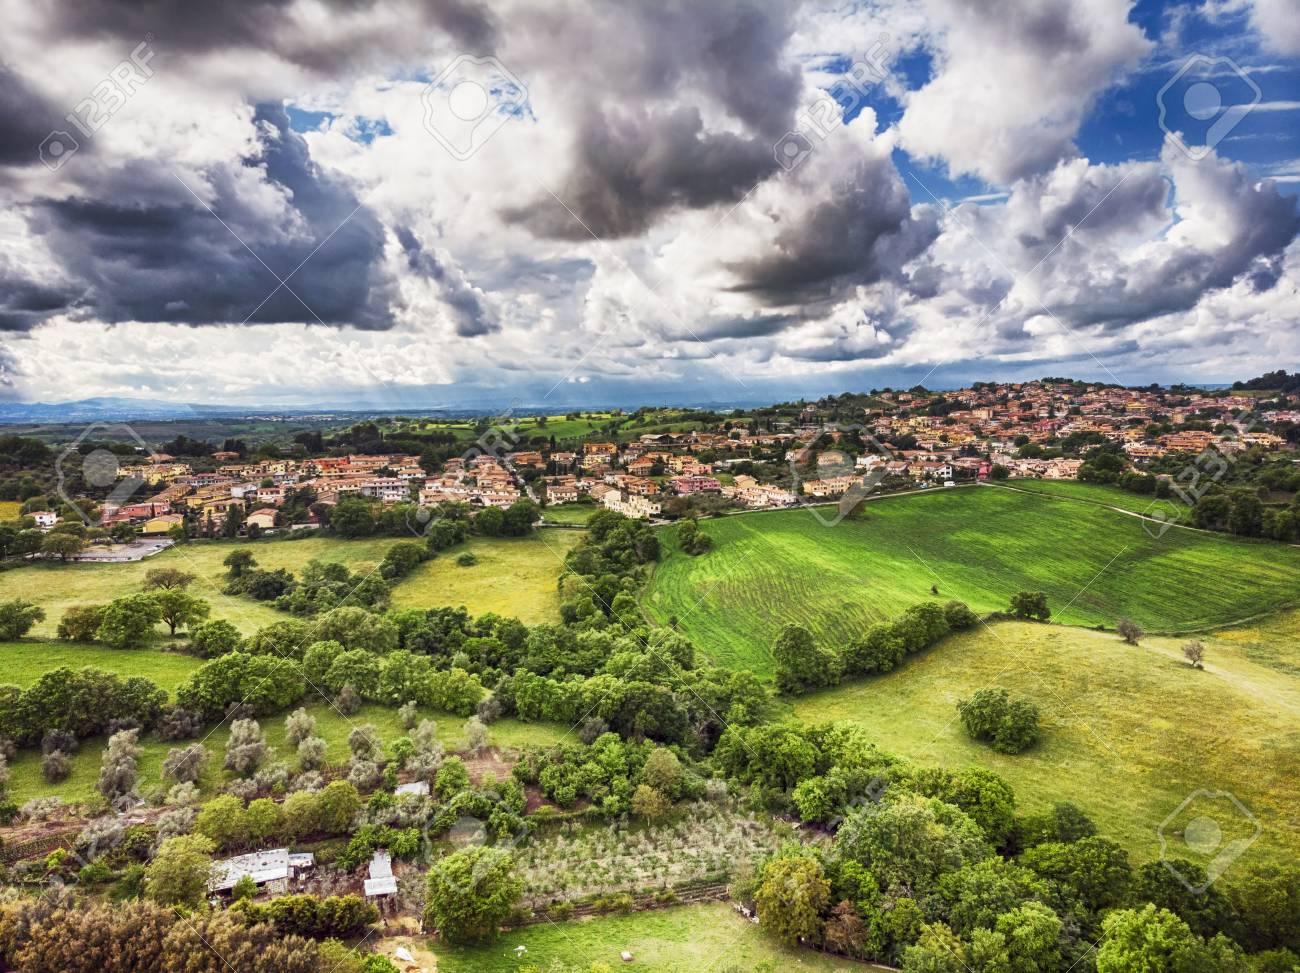 Showroom It Rignano Flaminio awe aerial view from green hills of rignano flaminio village..